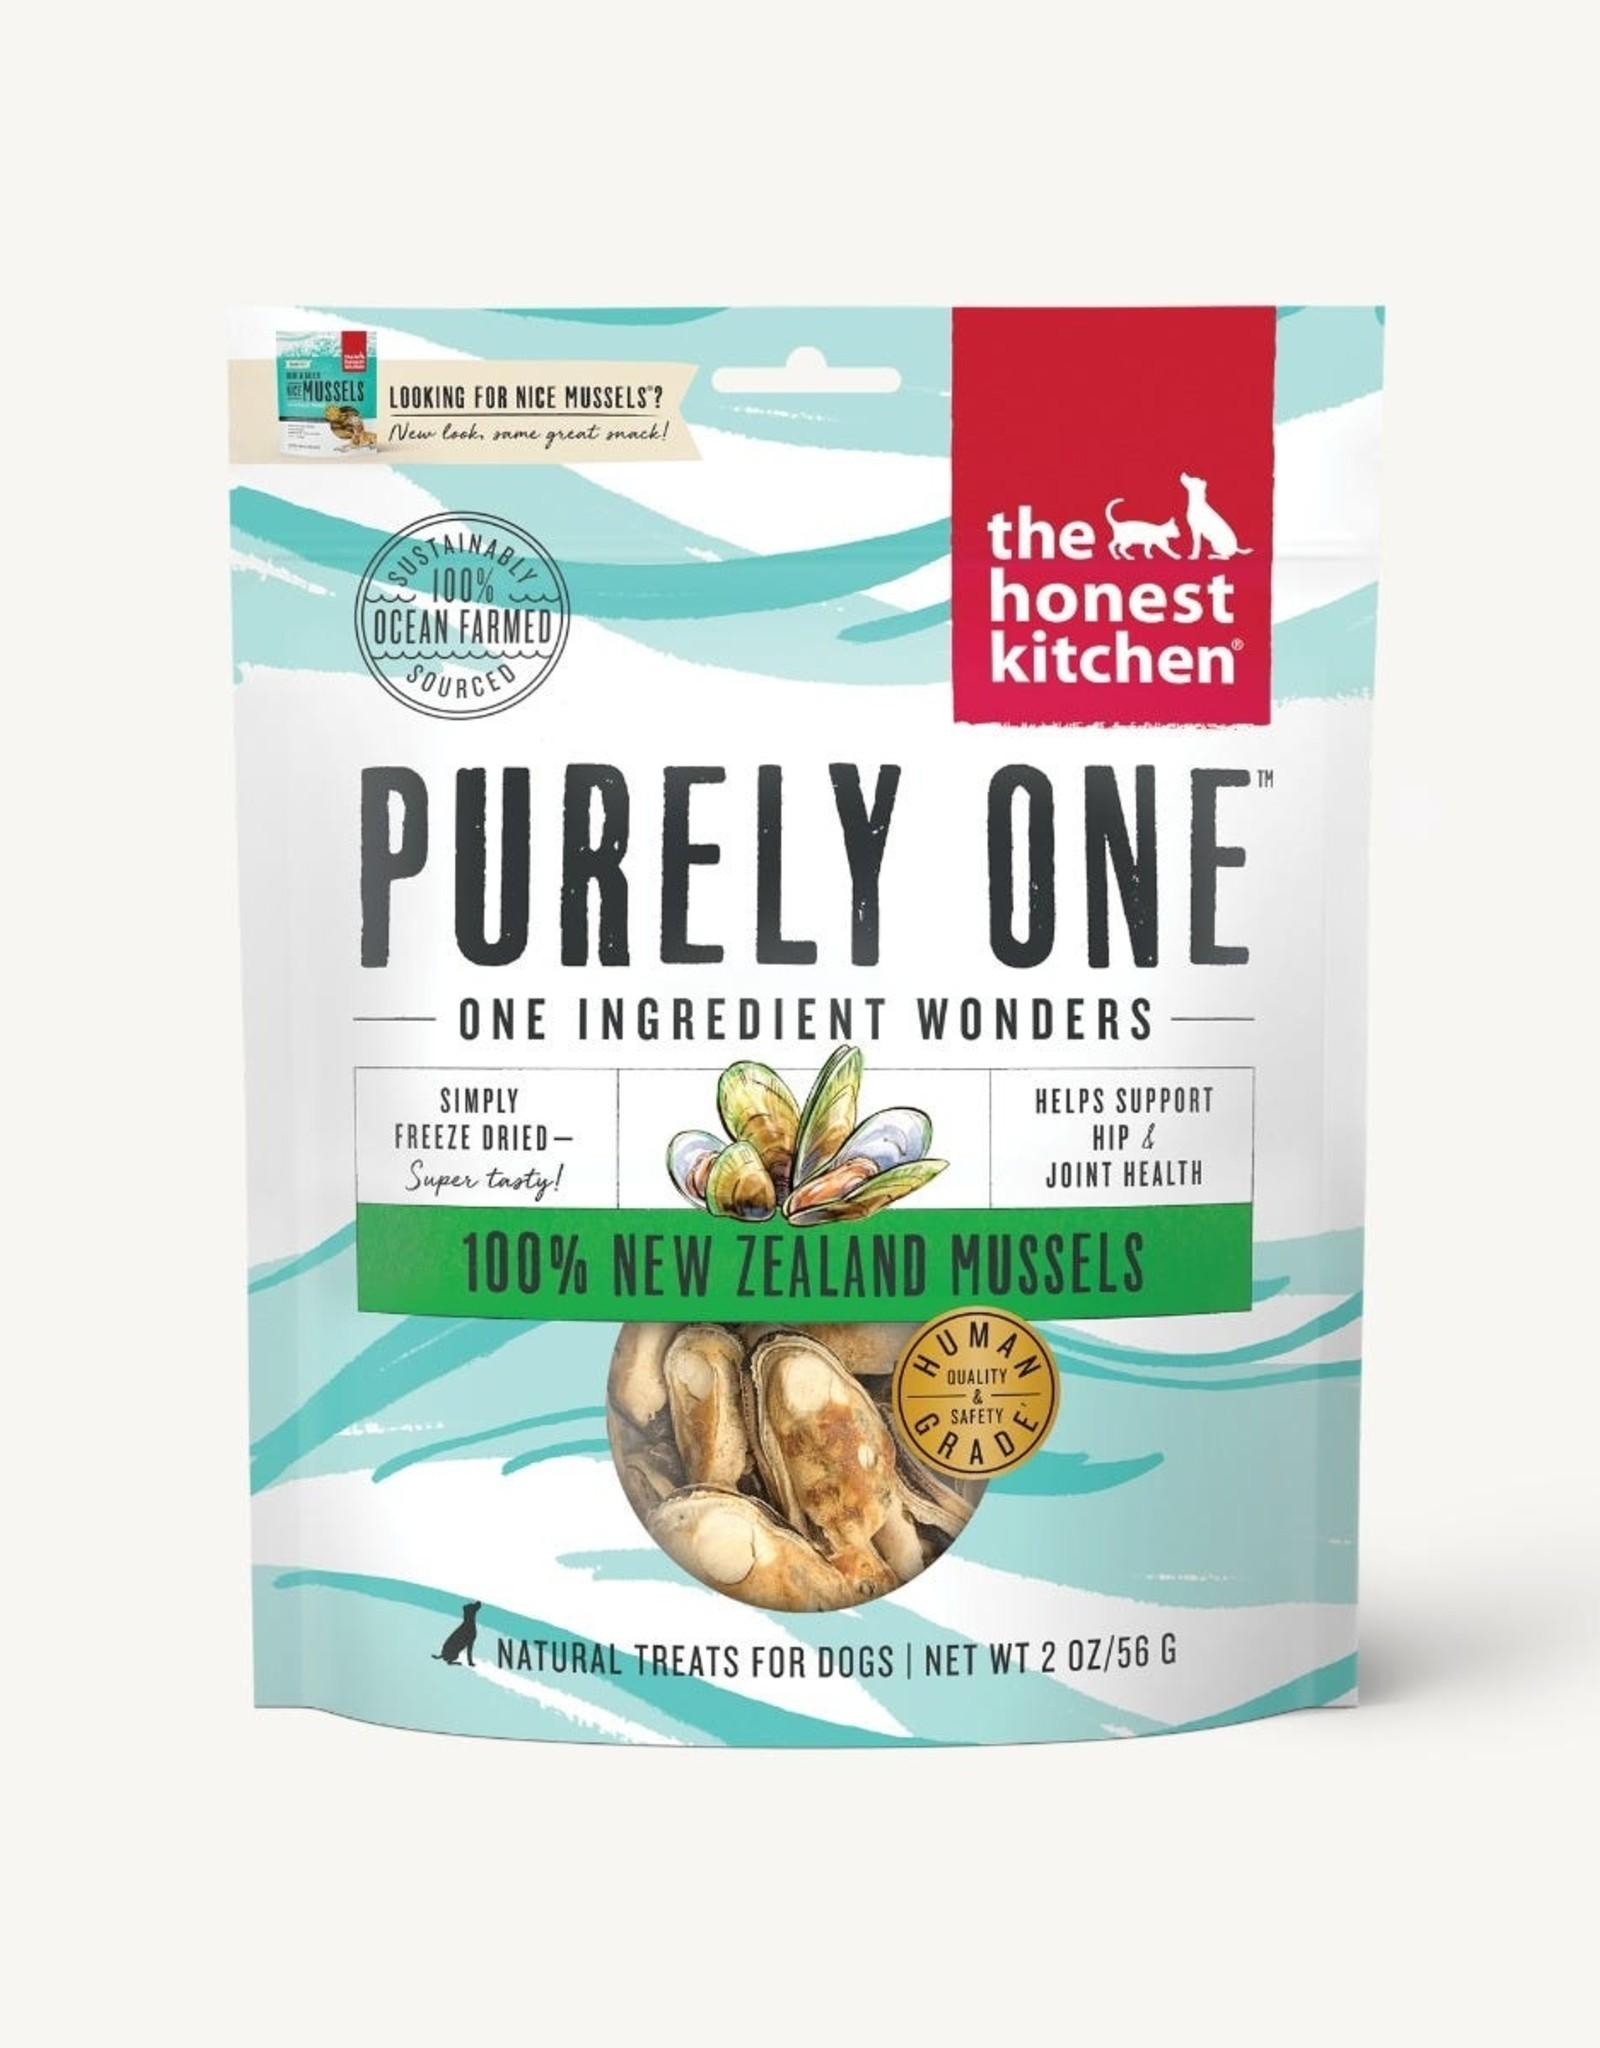 The Honest Kitchen New Zealand Mussels - 2oz